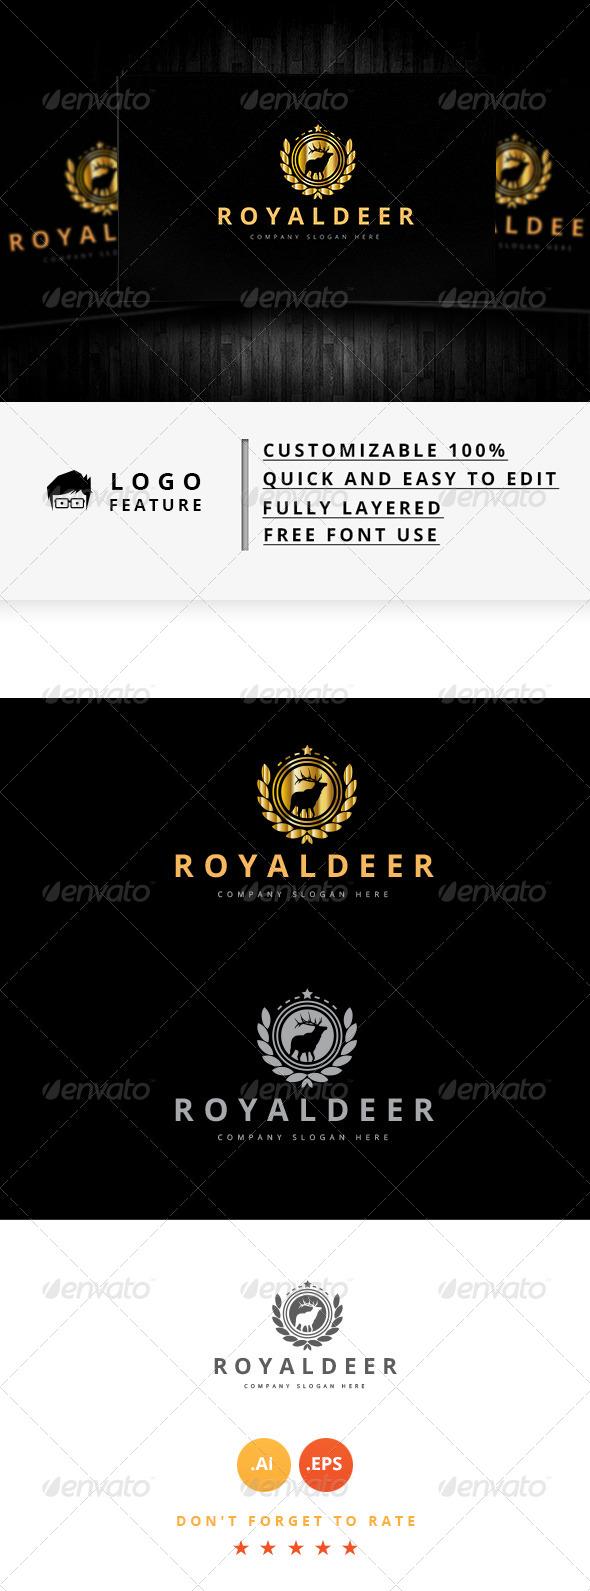 GraphicRiver Royal Deer 8103350